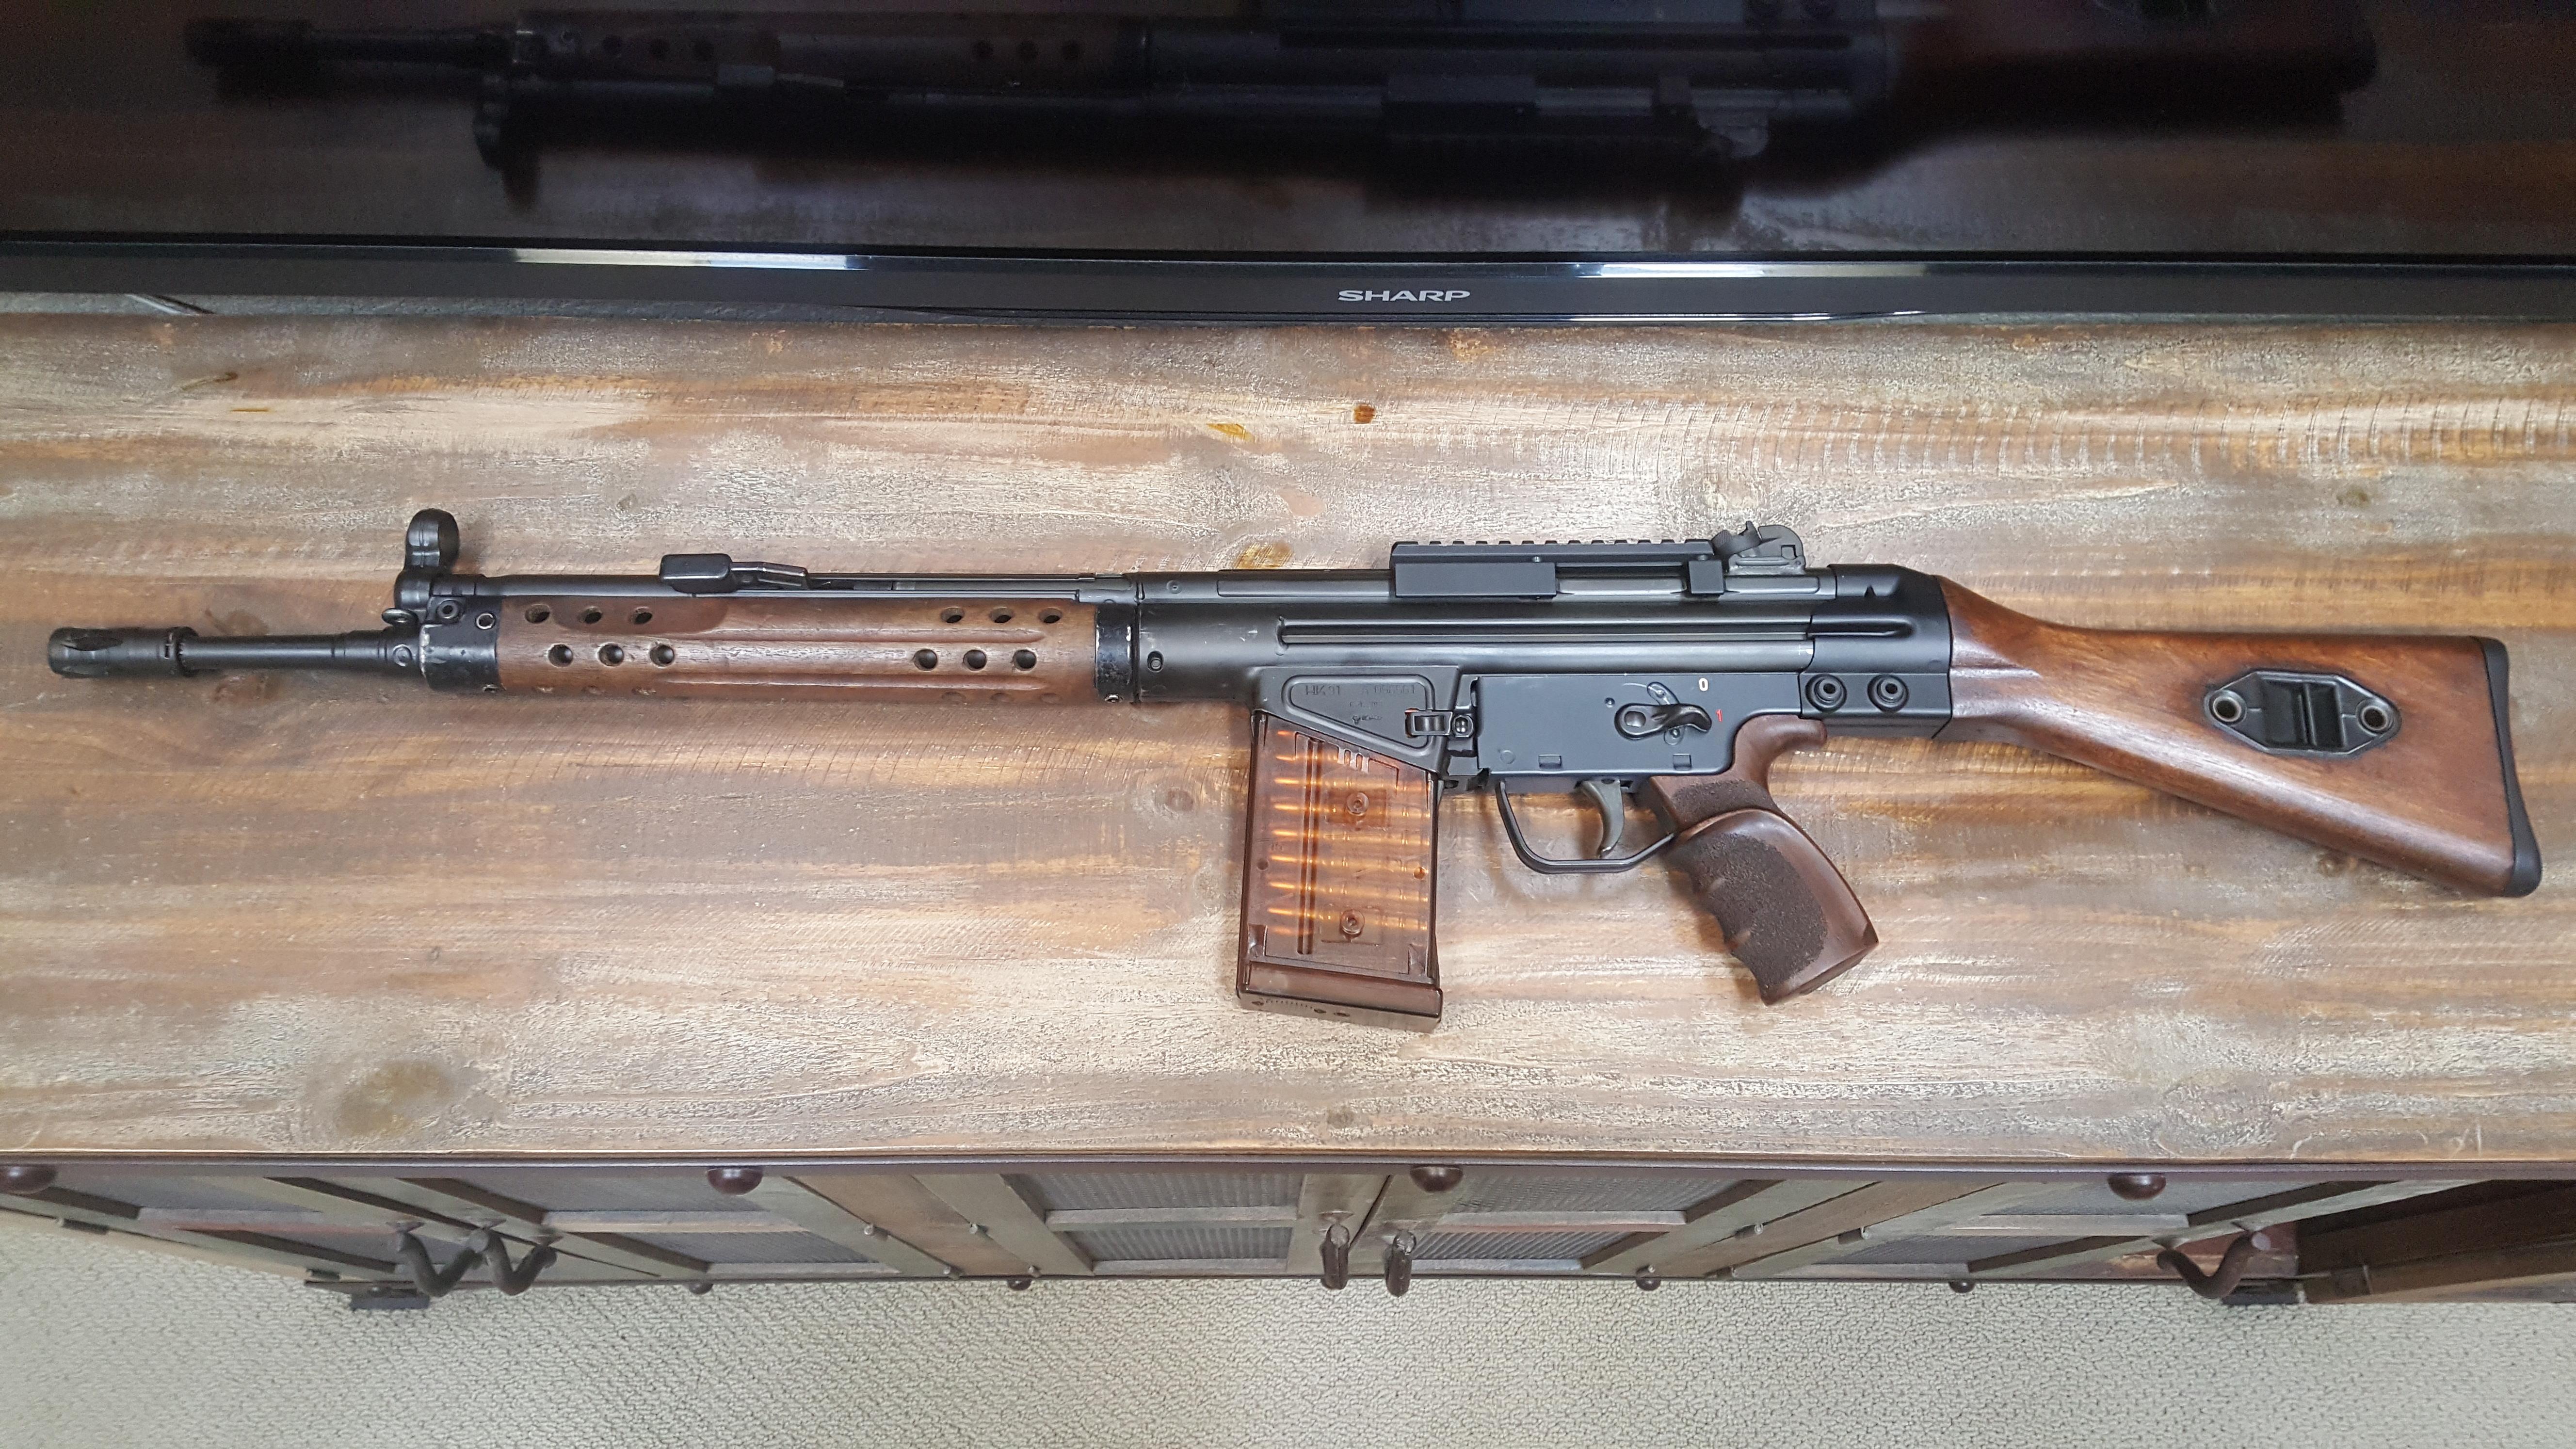 WTS: Misc. G3/91 Wood , USP parts accessories-20191115_104720.jpg